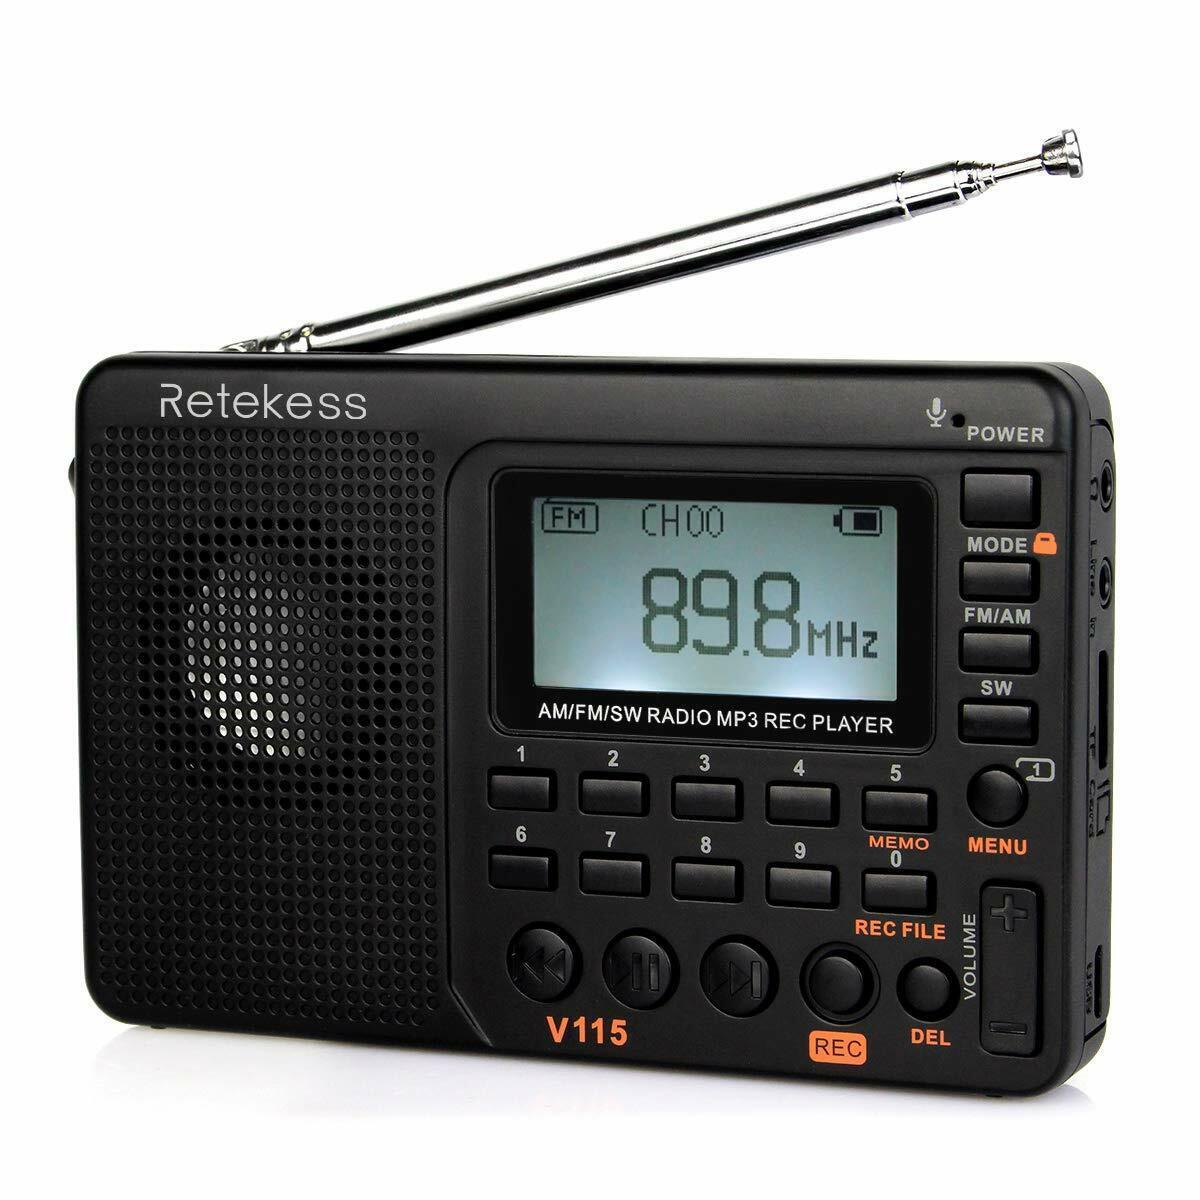 Portable Shortwave AM/FM Stereo Radio with MP3 Player Digita